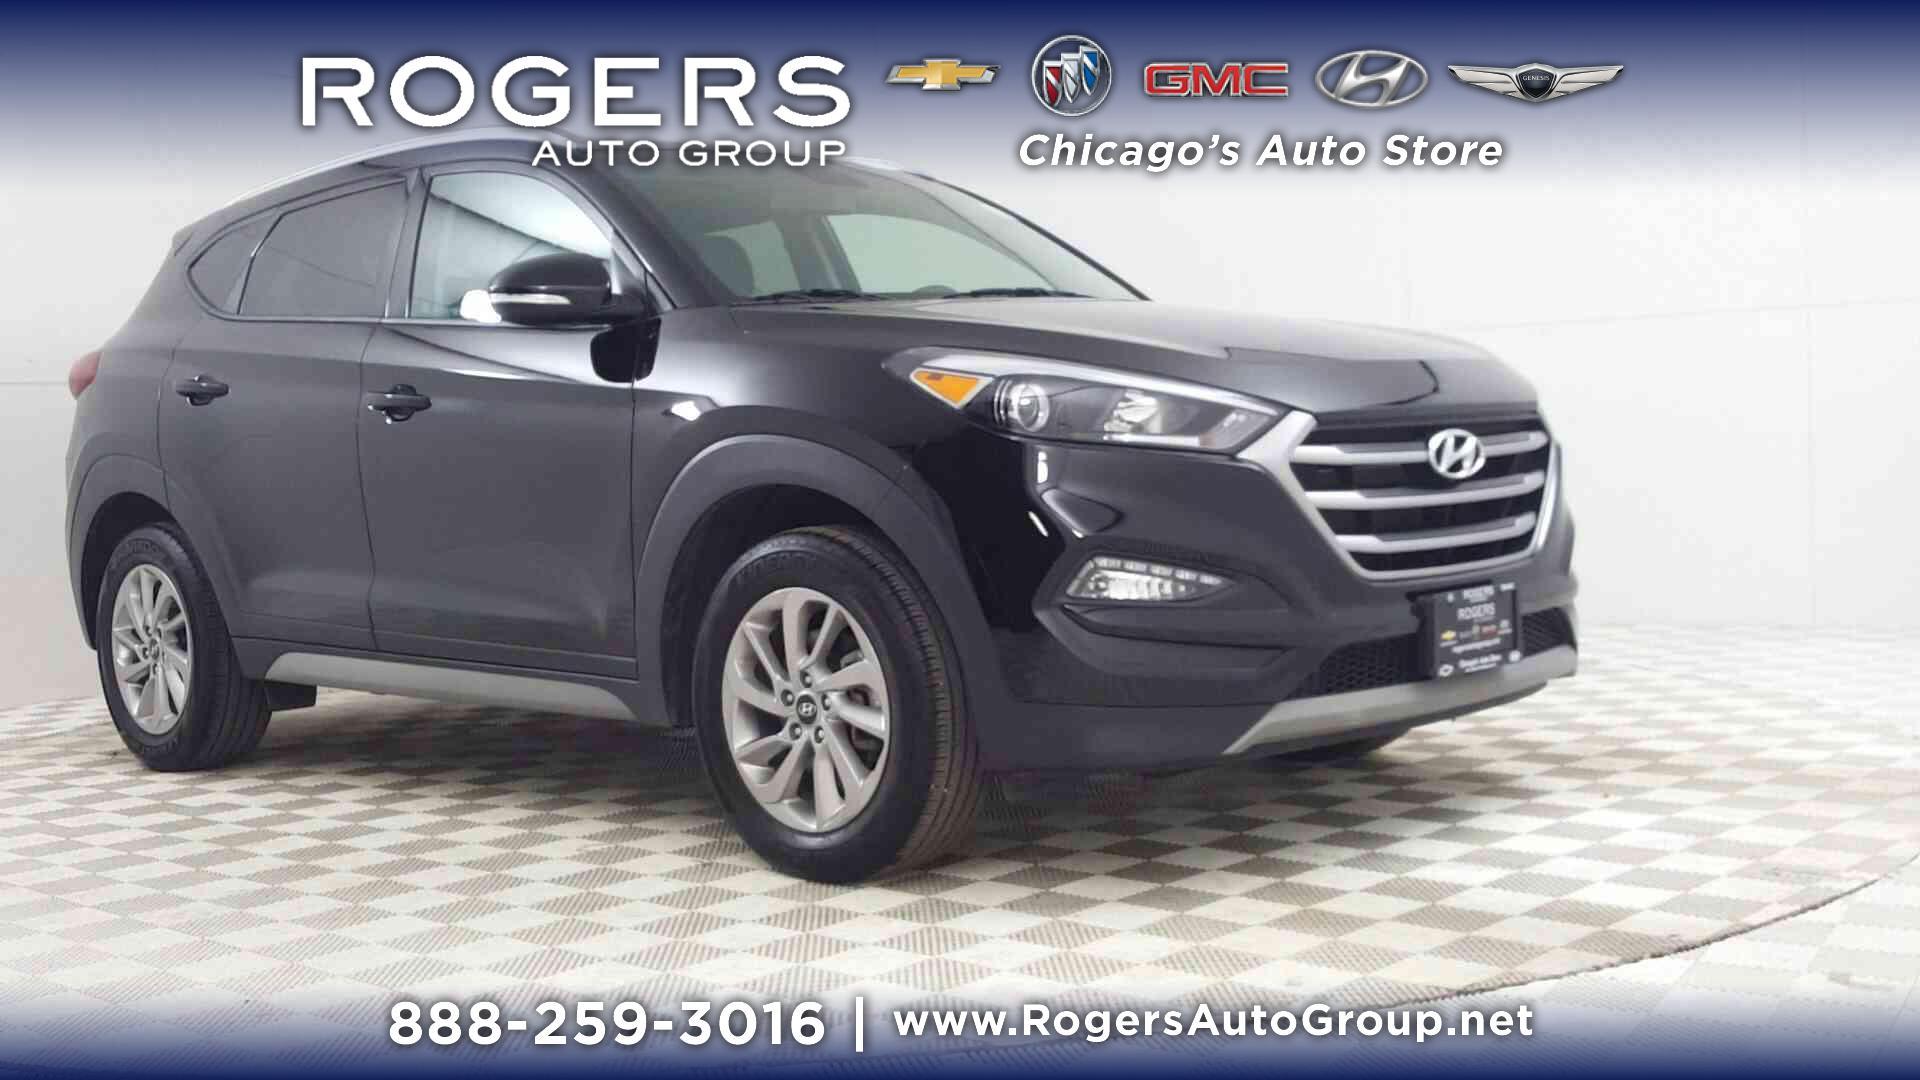 2017 Hyundai Tucson For Sale In Chicago Km8j3ca28hu494766 Rogers